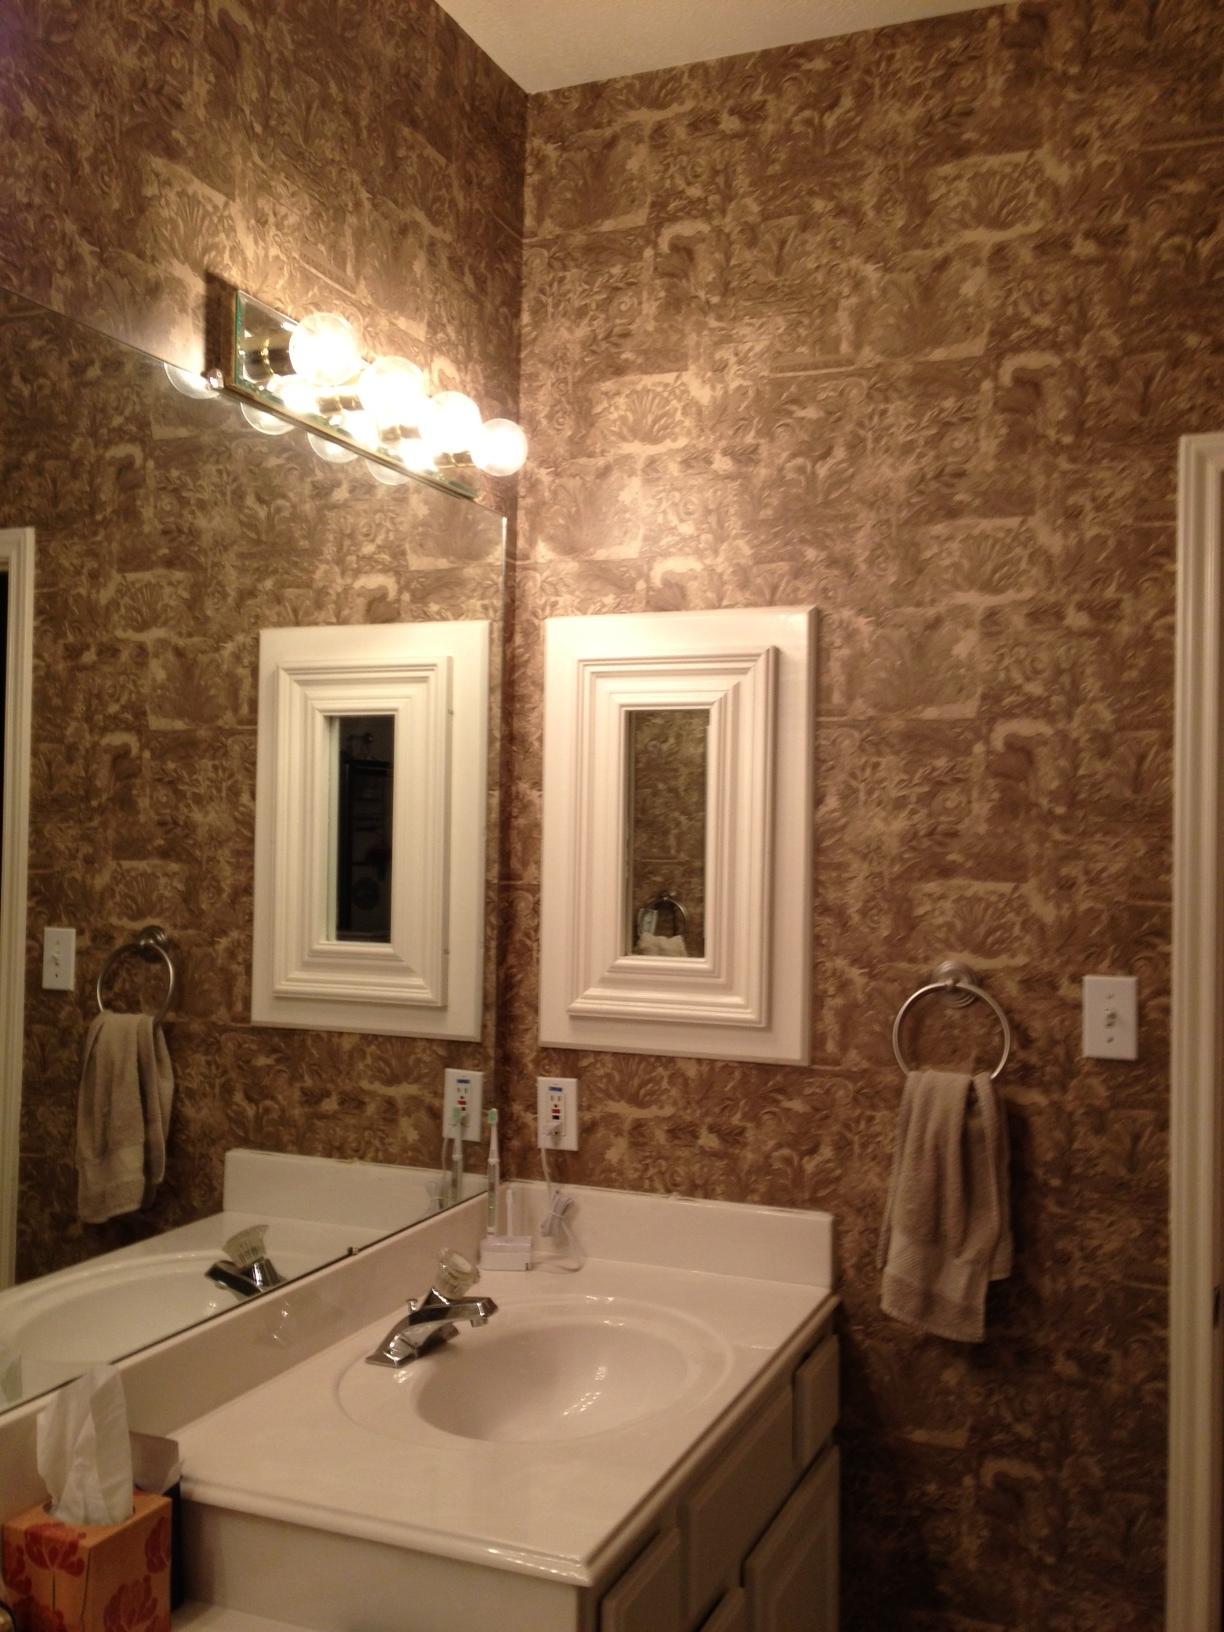 [50+] Paint Over Wallpaper in Bathroom on WallpaperSafari